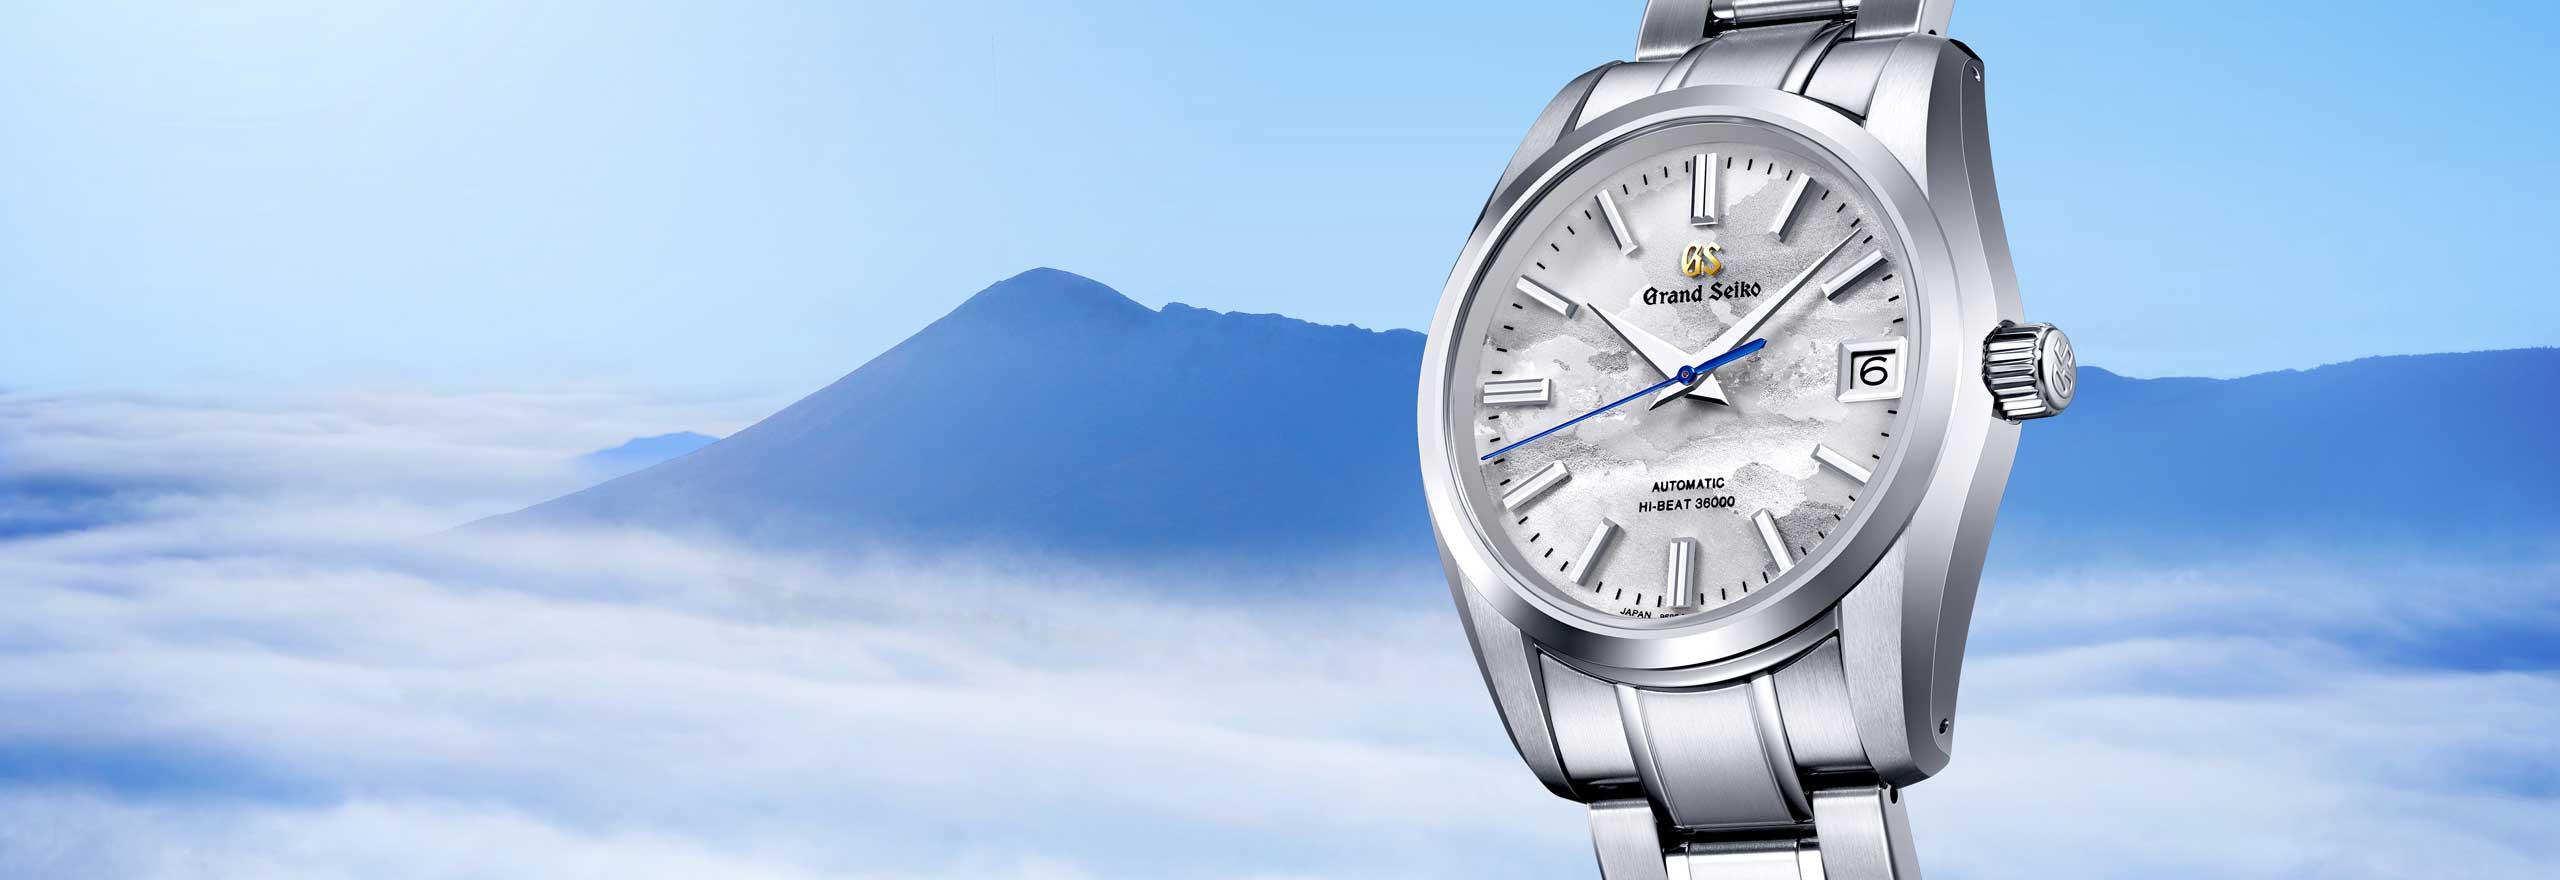 Novedades Relojes Grand Seiko. Seiko Boutique Madrid Tienda Oficial